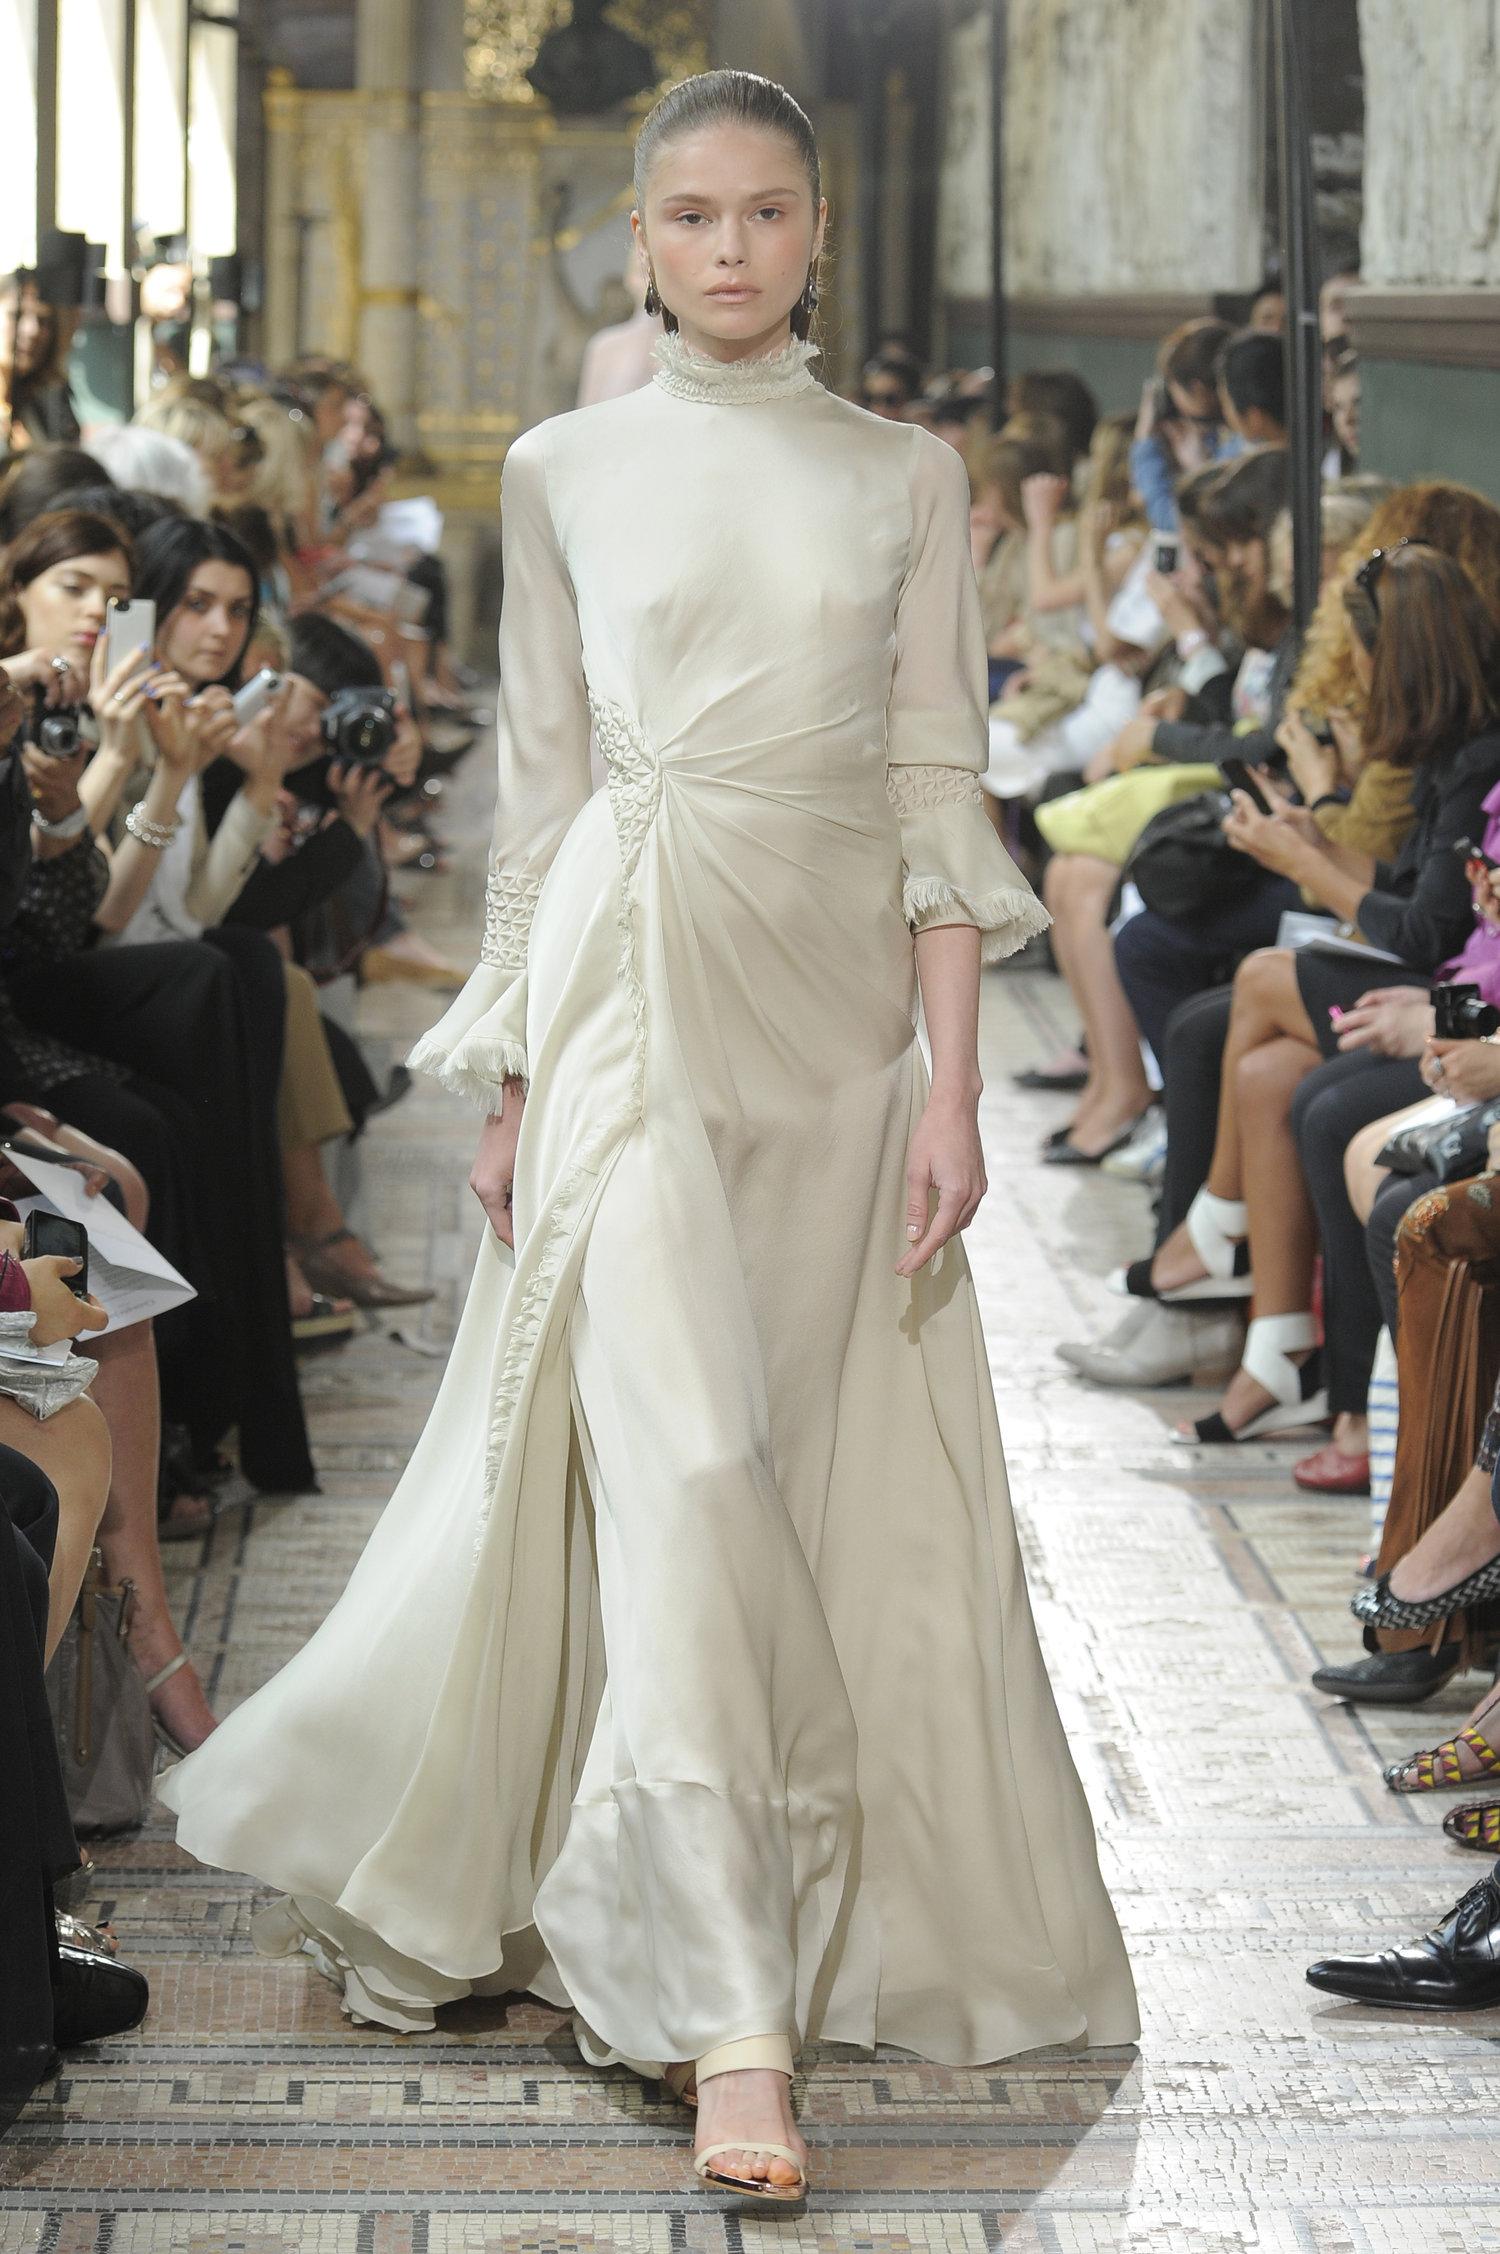 christophe-josse-couture-fw13-14-look-16.jpg